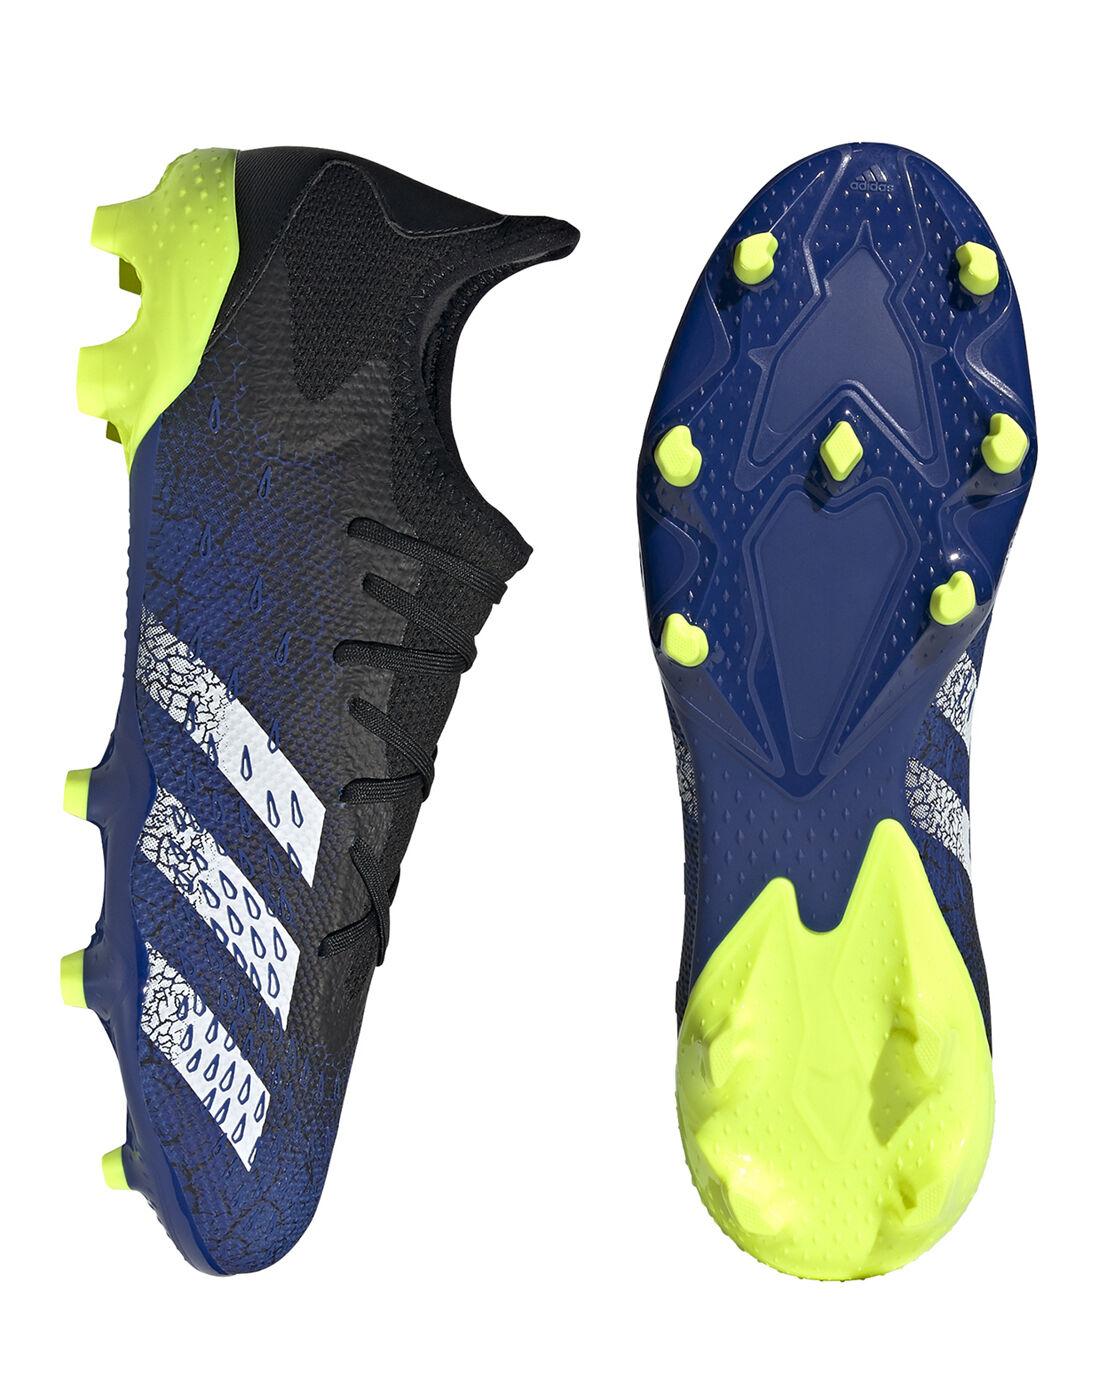 adidas adidas climacool 1 camo black hoodie shoes | Adult Predator 20.3 Low Firm Ground